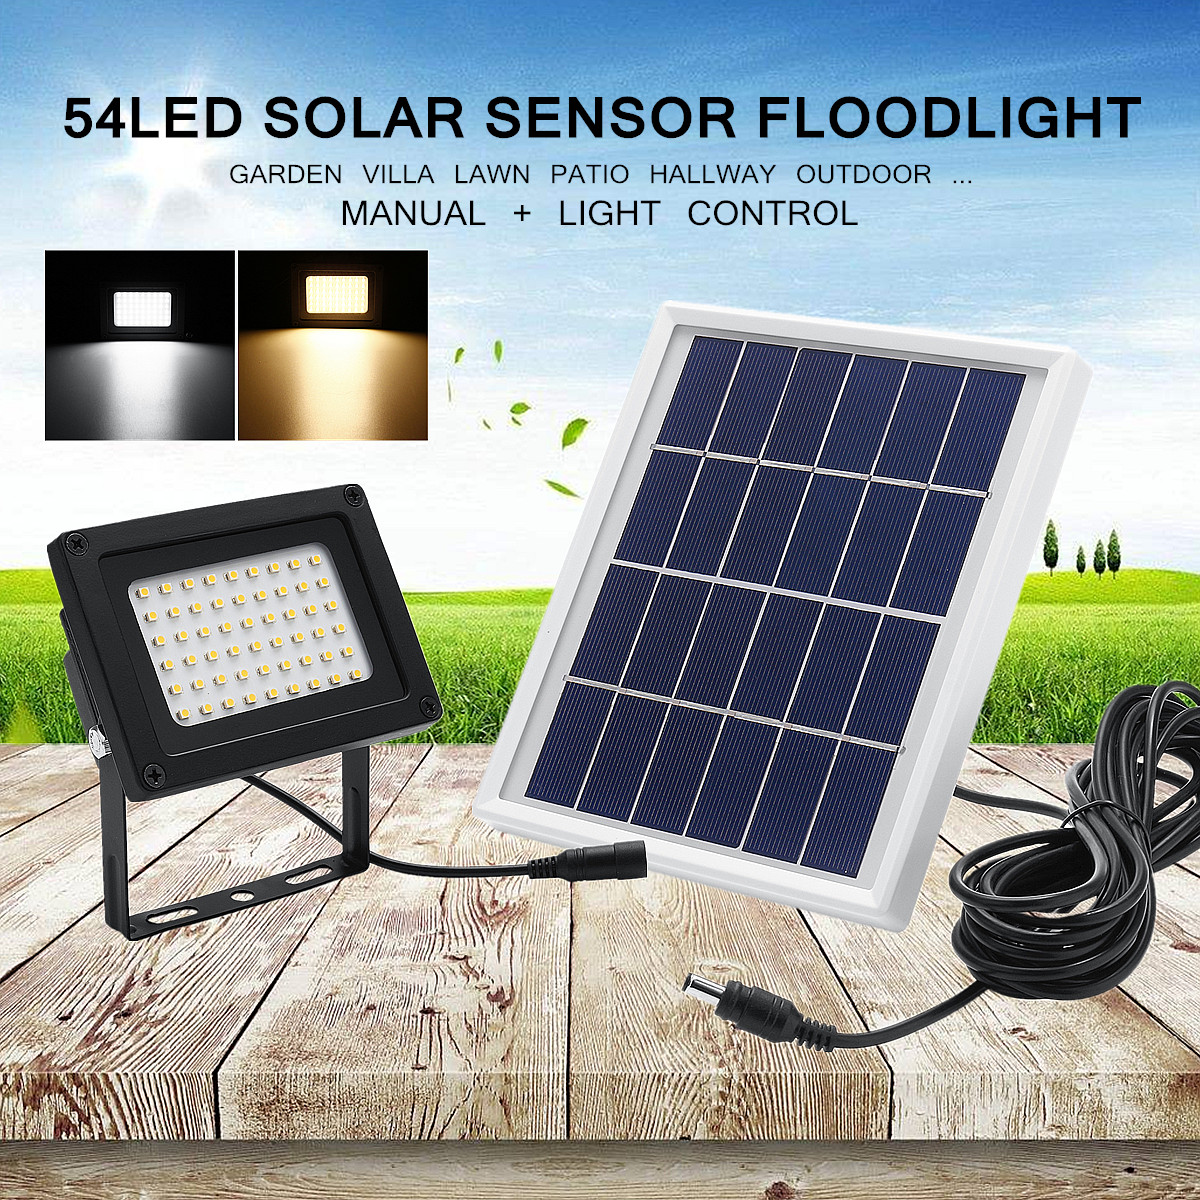 54  LED Super Bright Solar Powered Lamp Flood Light Spot Lamp Wall Light Dusk-to-Dawn Sensor Waterproof + Solar Panel